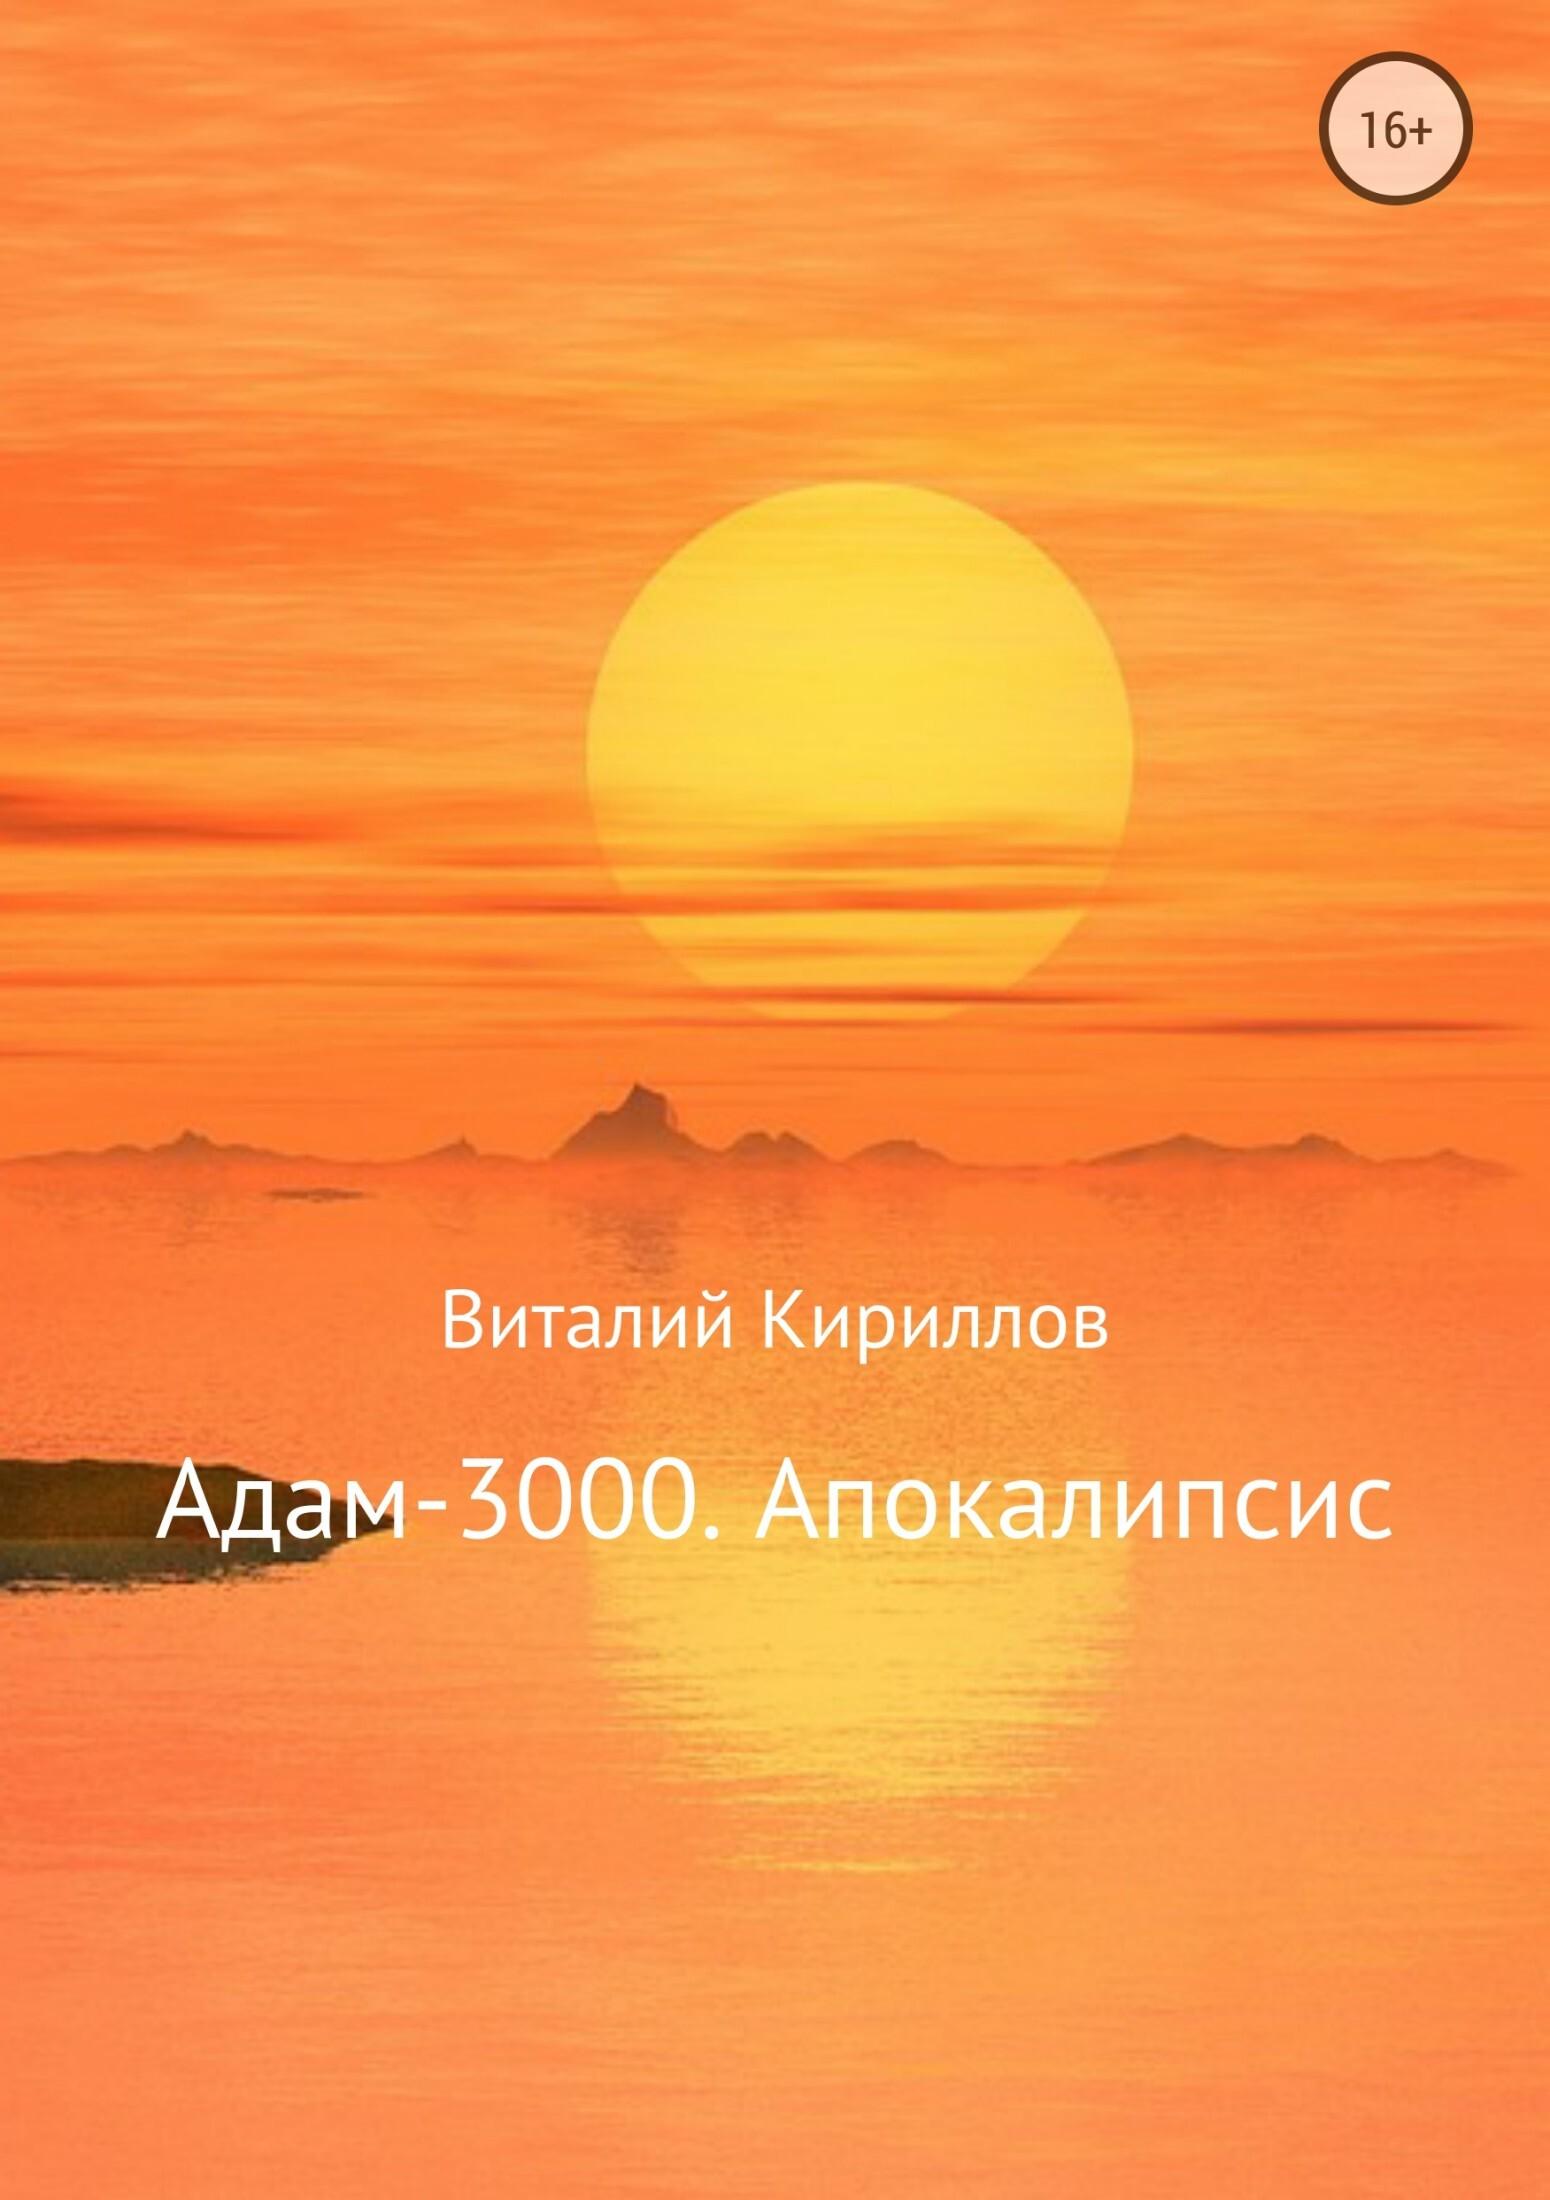 Виталий Александрович Кириллов Адам-3000. Апокалипсис марта шарлай адам вспоминает